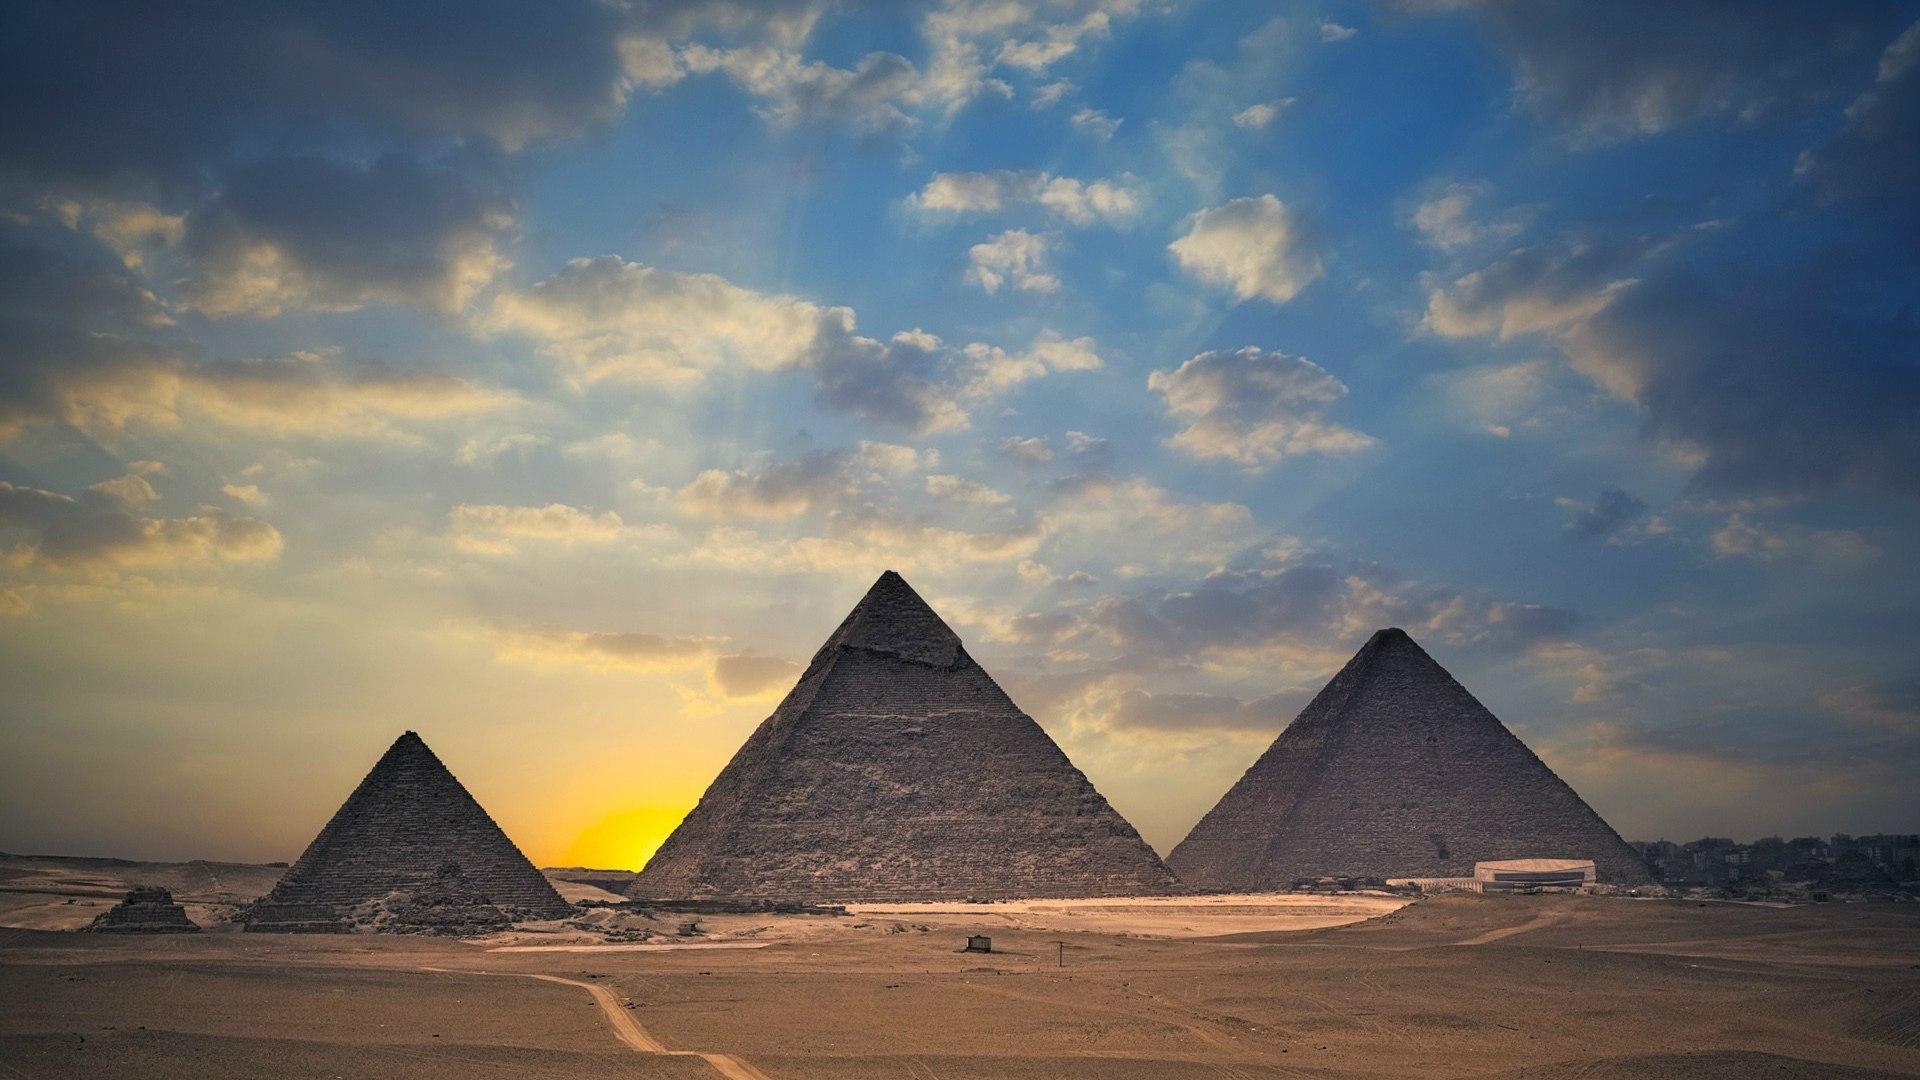 http://www.zastavki.com/pictures/originals/2015/World___Egypt_Pyramids_of_Giza__Egypt_096428_.jpg